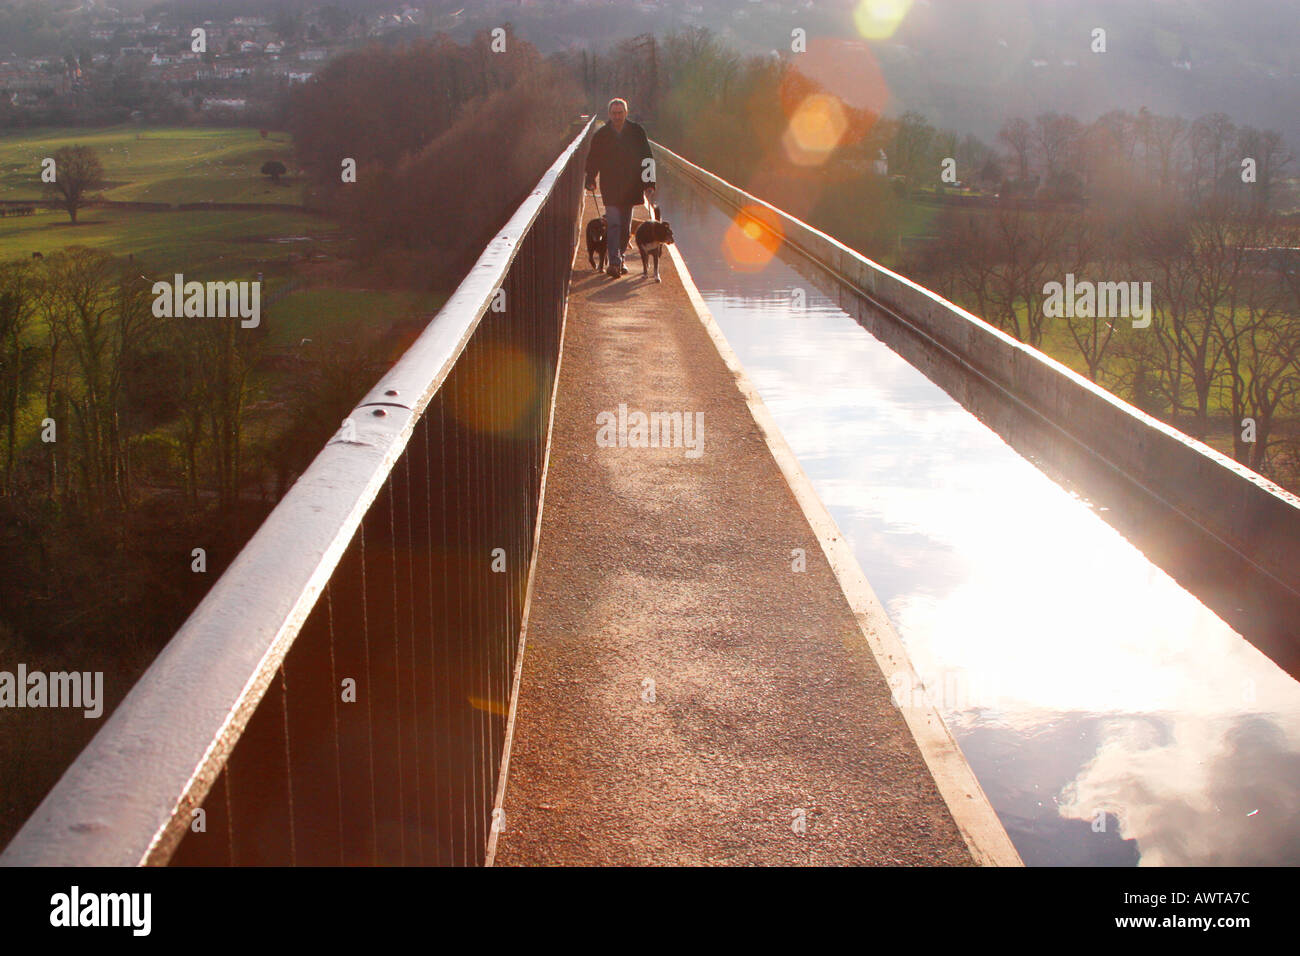 Shropshire Union Canal Aqueduct Pont Cysyllte Clwyd Wales - Stock Image